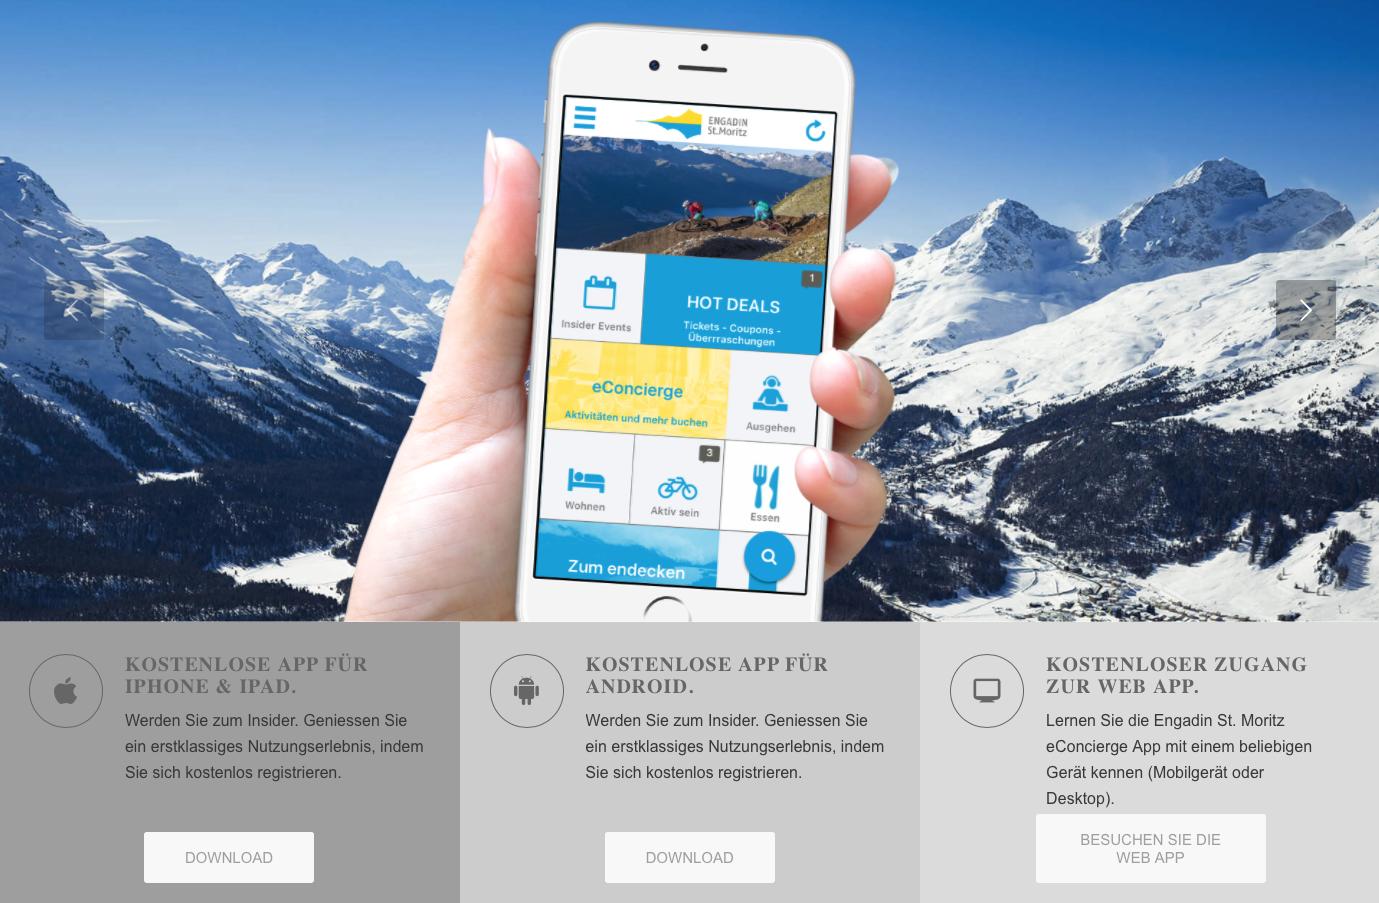 Engadin St. Moritz eConcierge App Slide 1